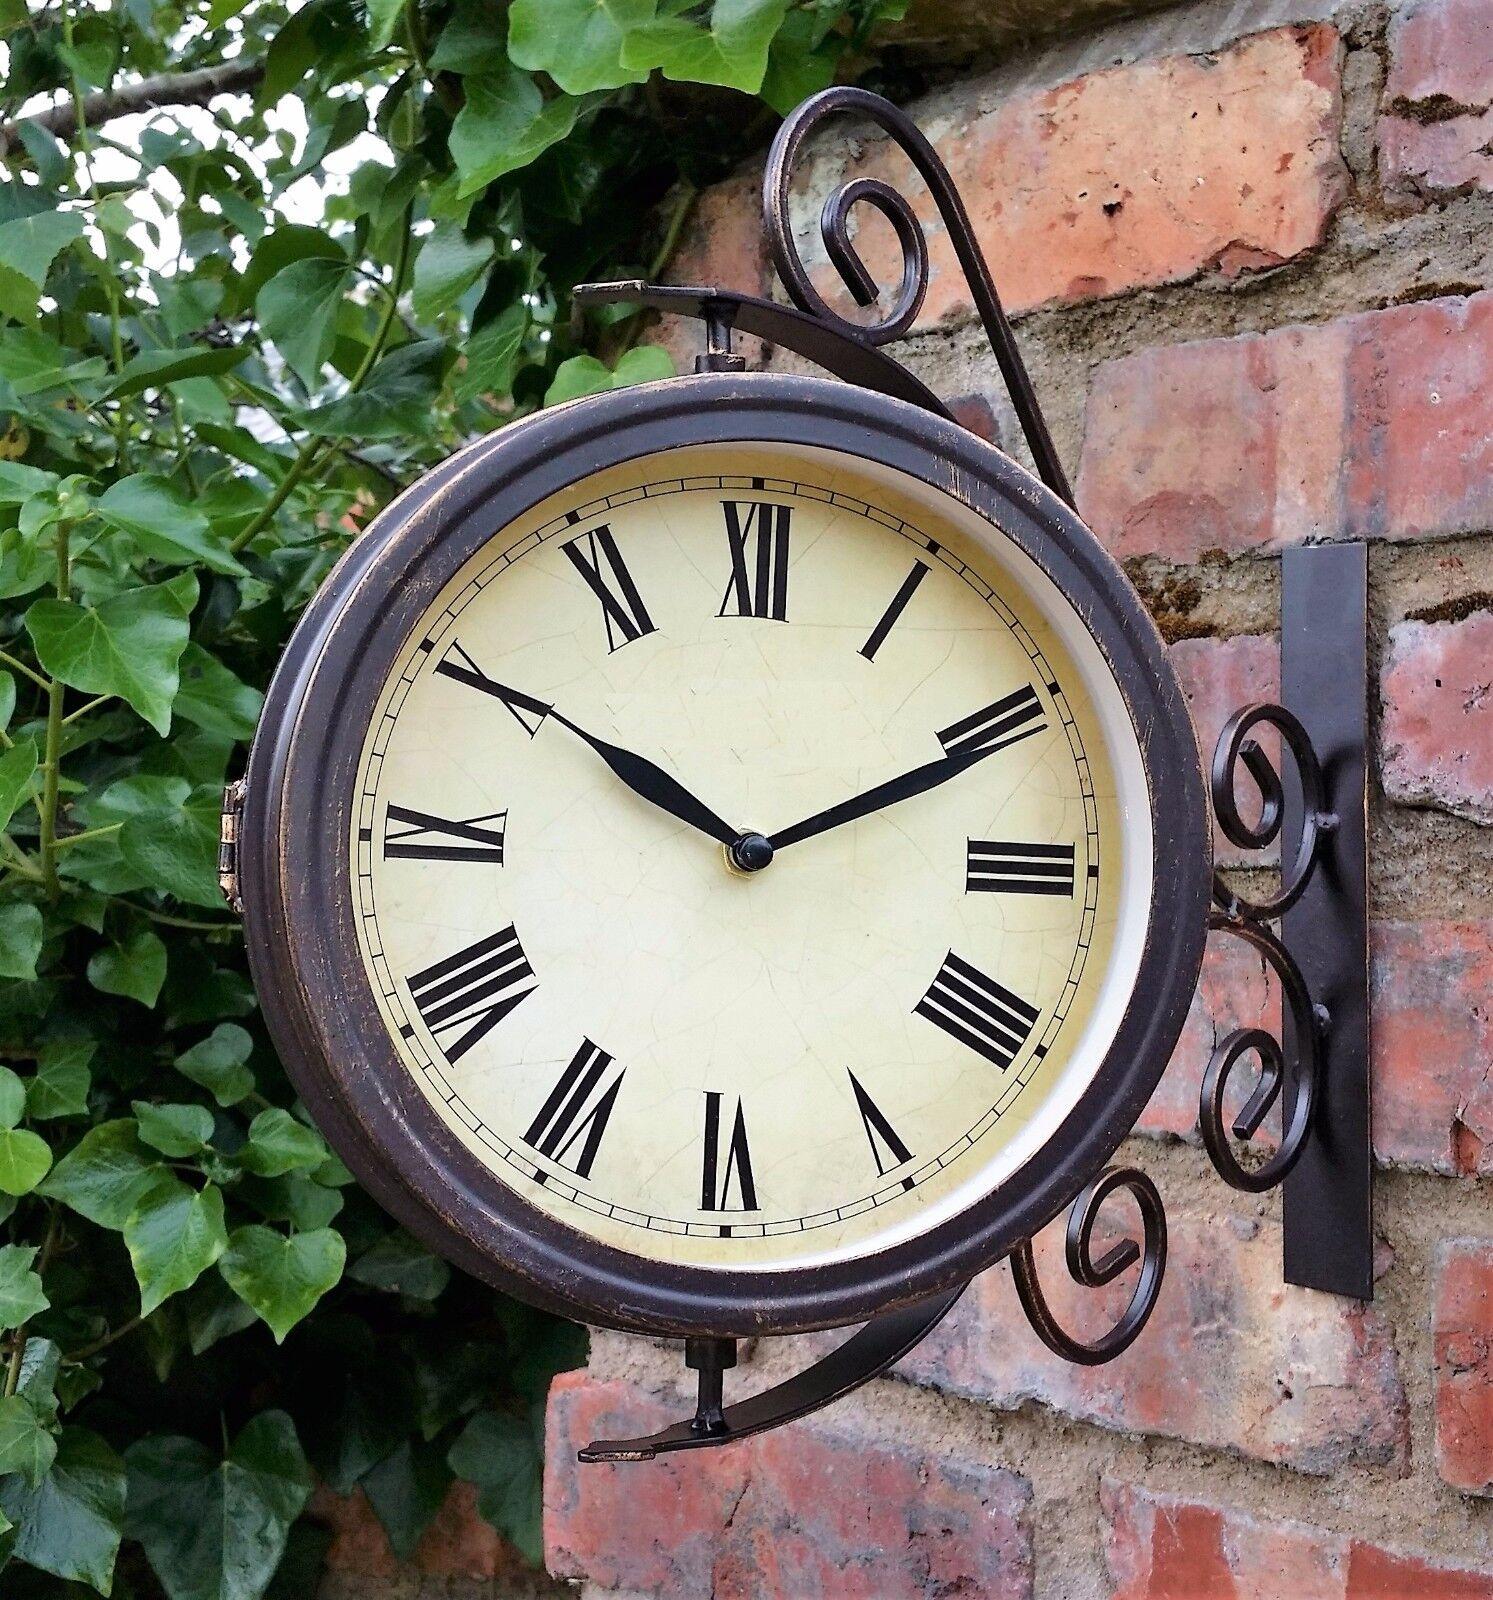 Outdoor Garden Wall Art: OUTDOOR GARDEN WALL Station Clock & Temperature With